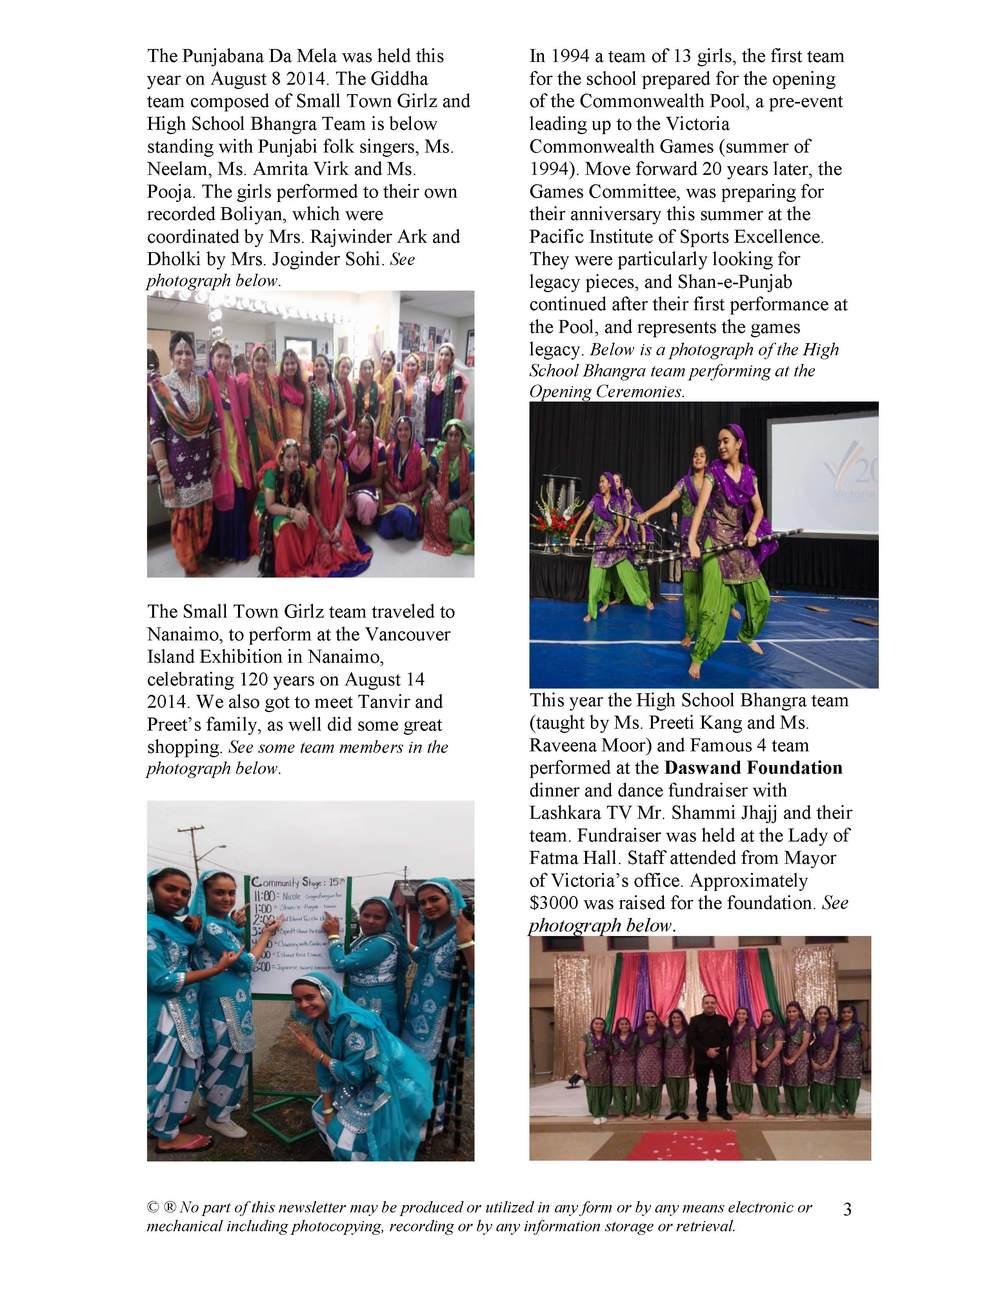 Newsletter_Volume 10_2014 FINAL_Page_3.jpg